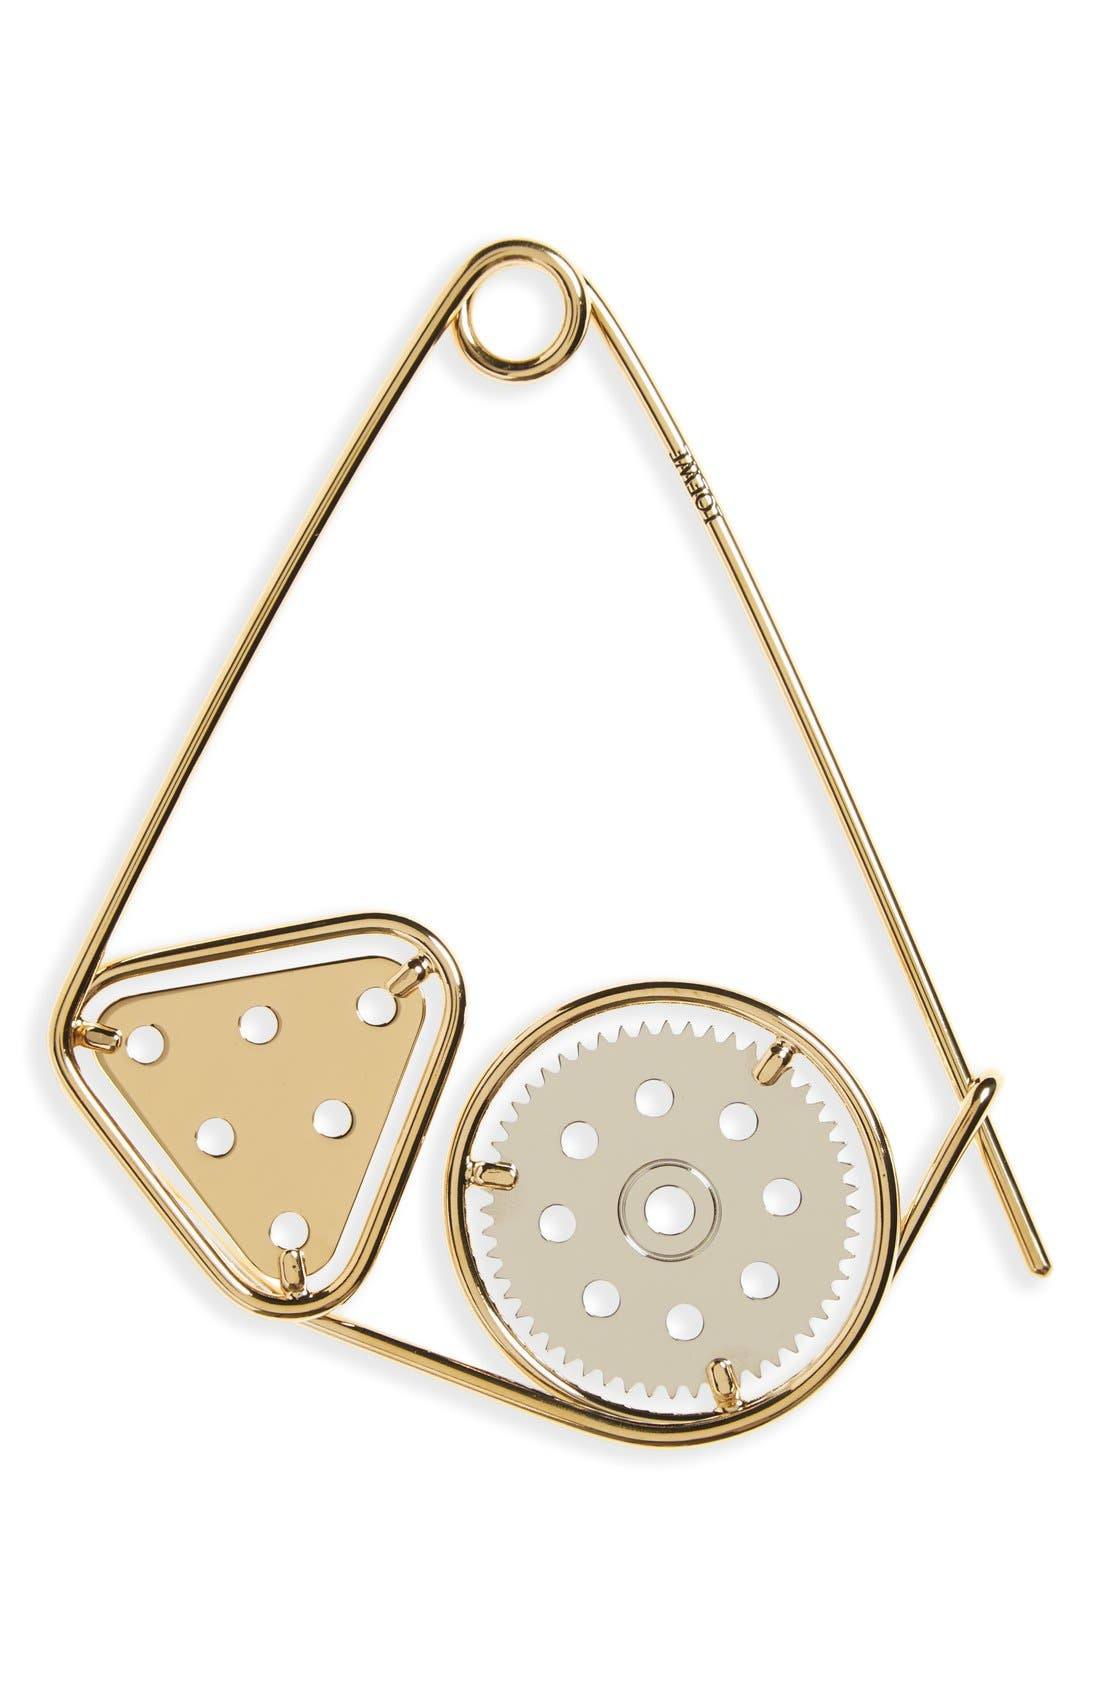 'Meccano' Double Pin Bag Charm,                         Main,                         color, Palladium/ Gold